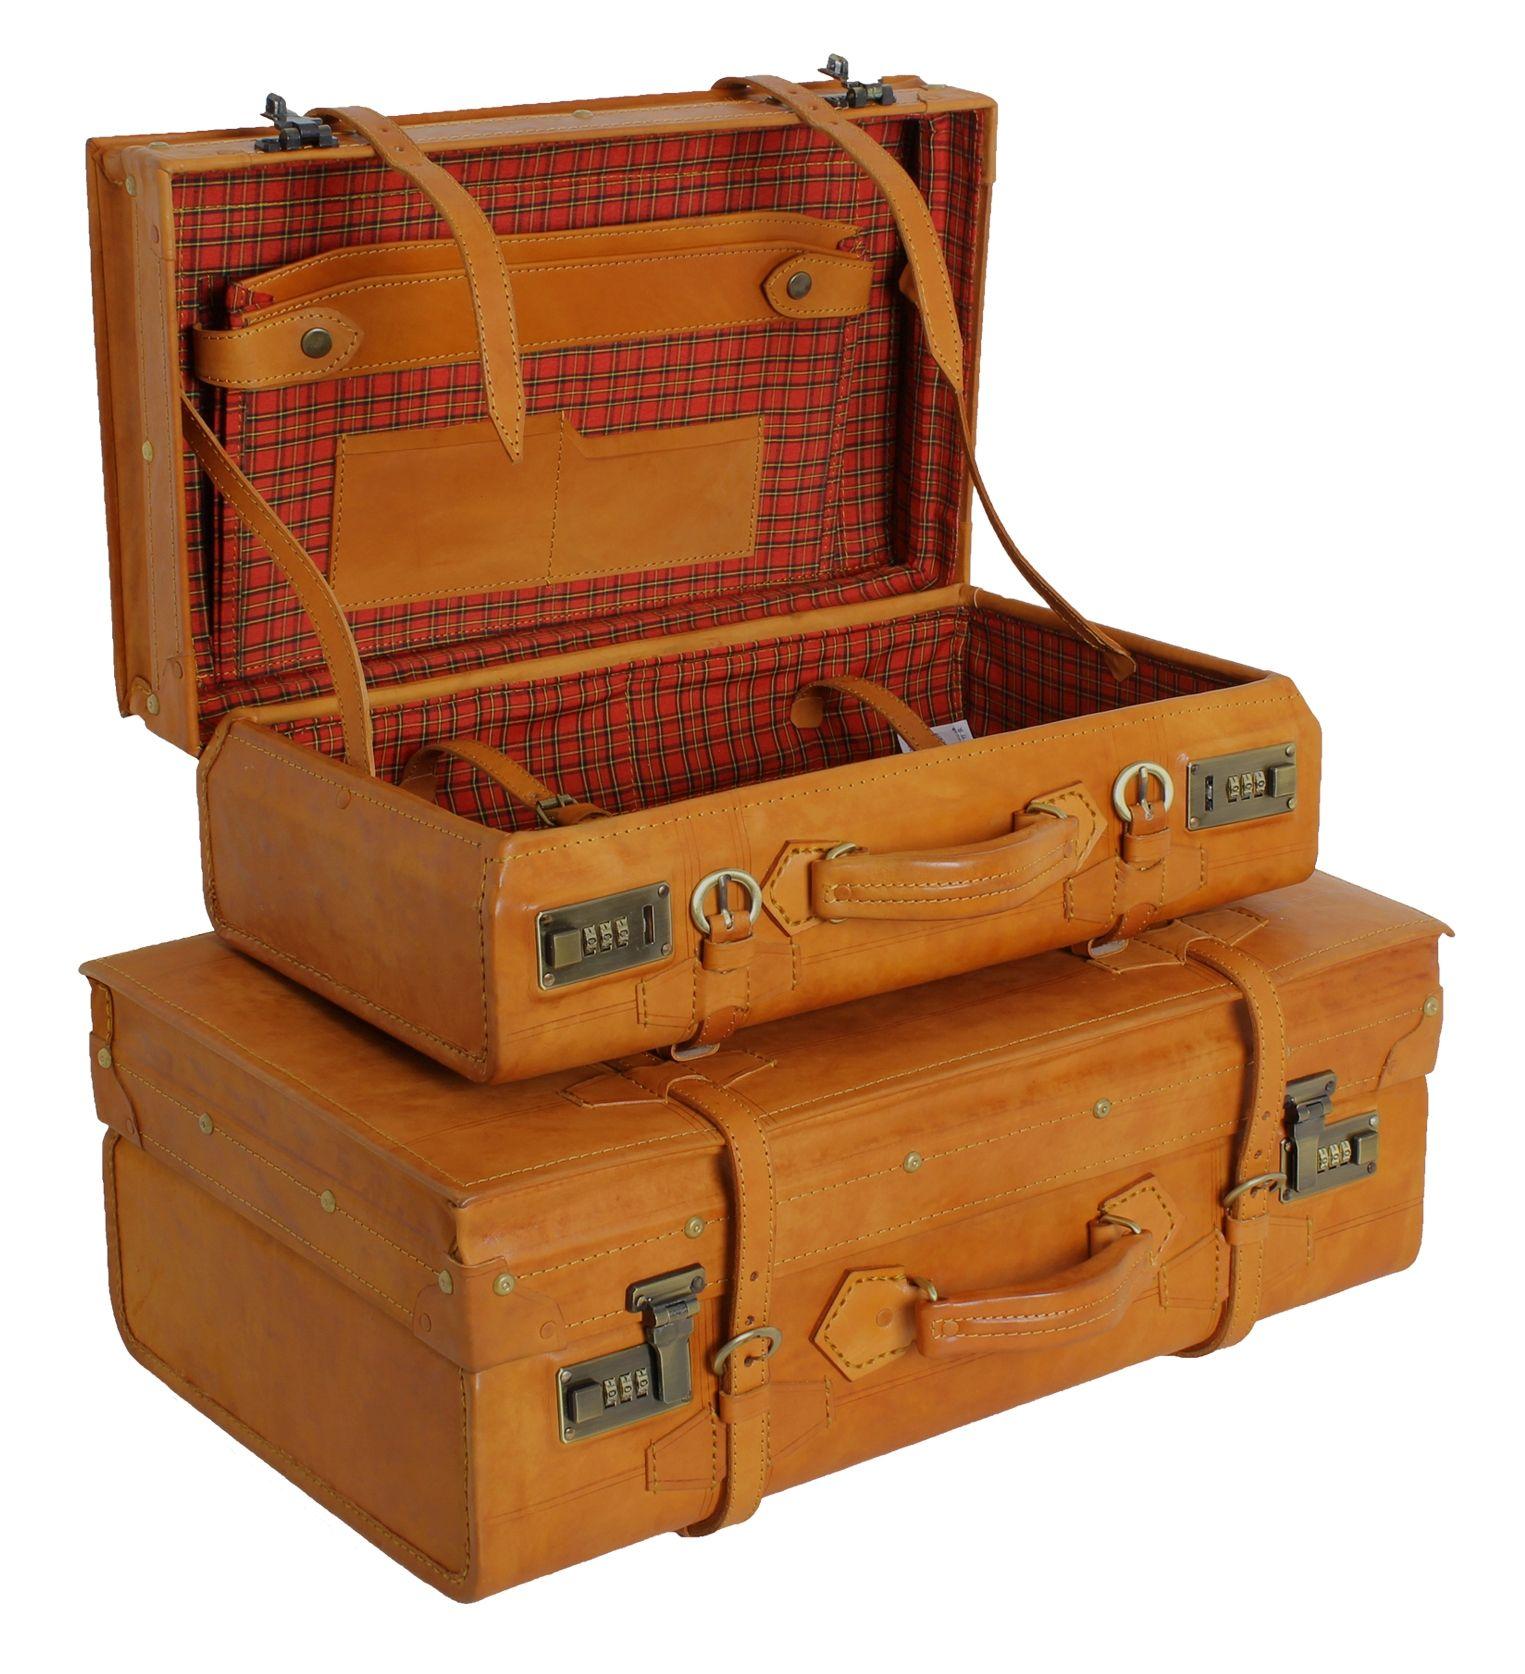 Large Leather Suitcase | Suitcase | Pinterest